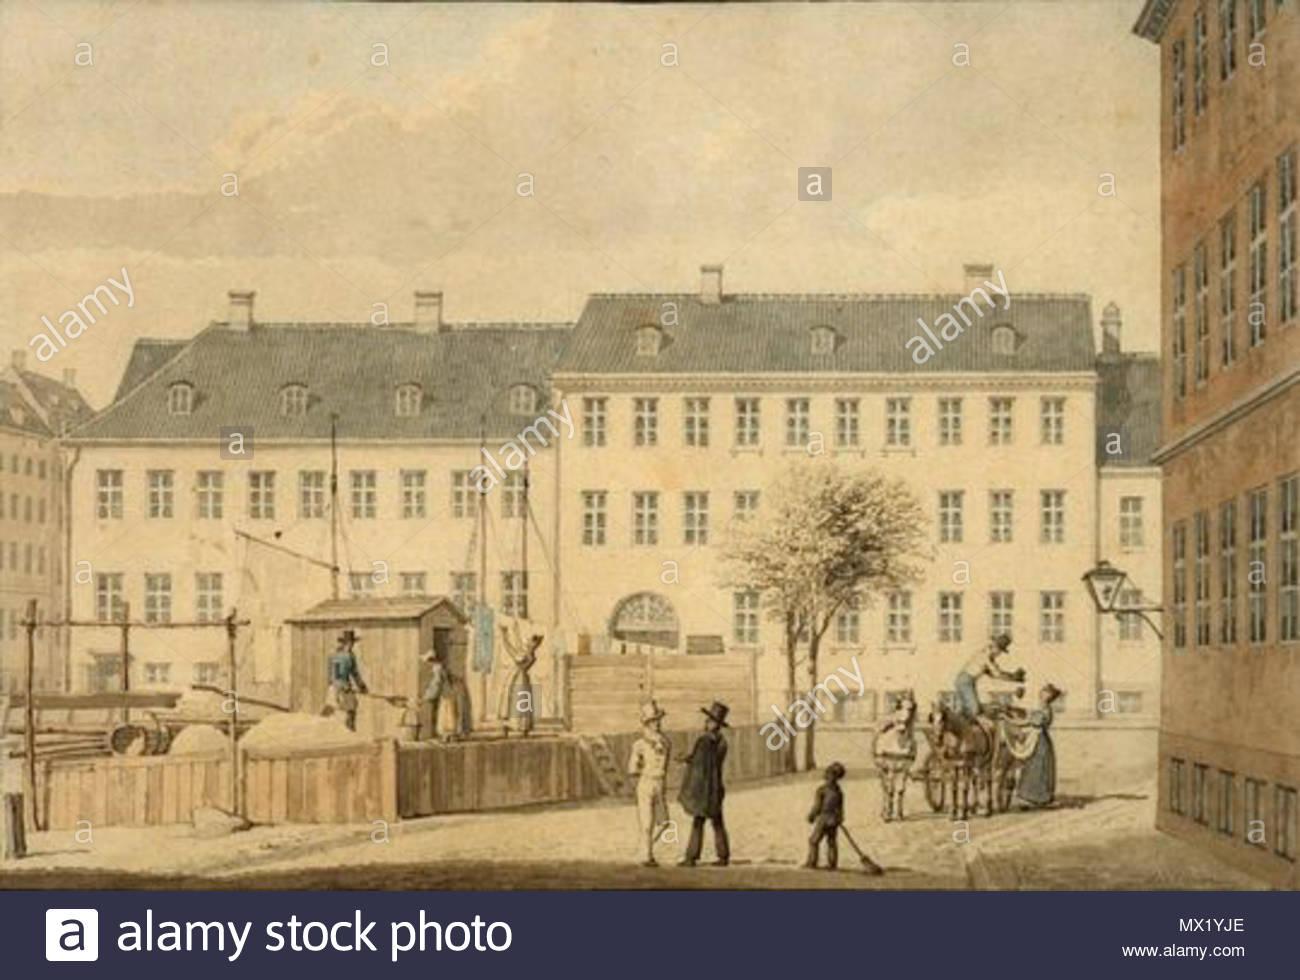 . Sandkiste (sand deposit?) - at Frederiksholms Kanal in Copenhagen, Denmark . 1835. G. F. Holm 263 H. G. F. Holm - Frederiksholms Kanal, 1835 - Stock Image